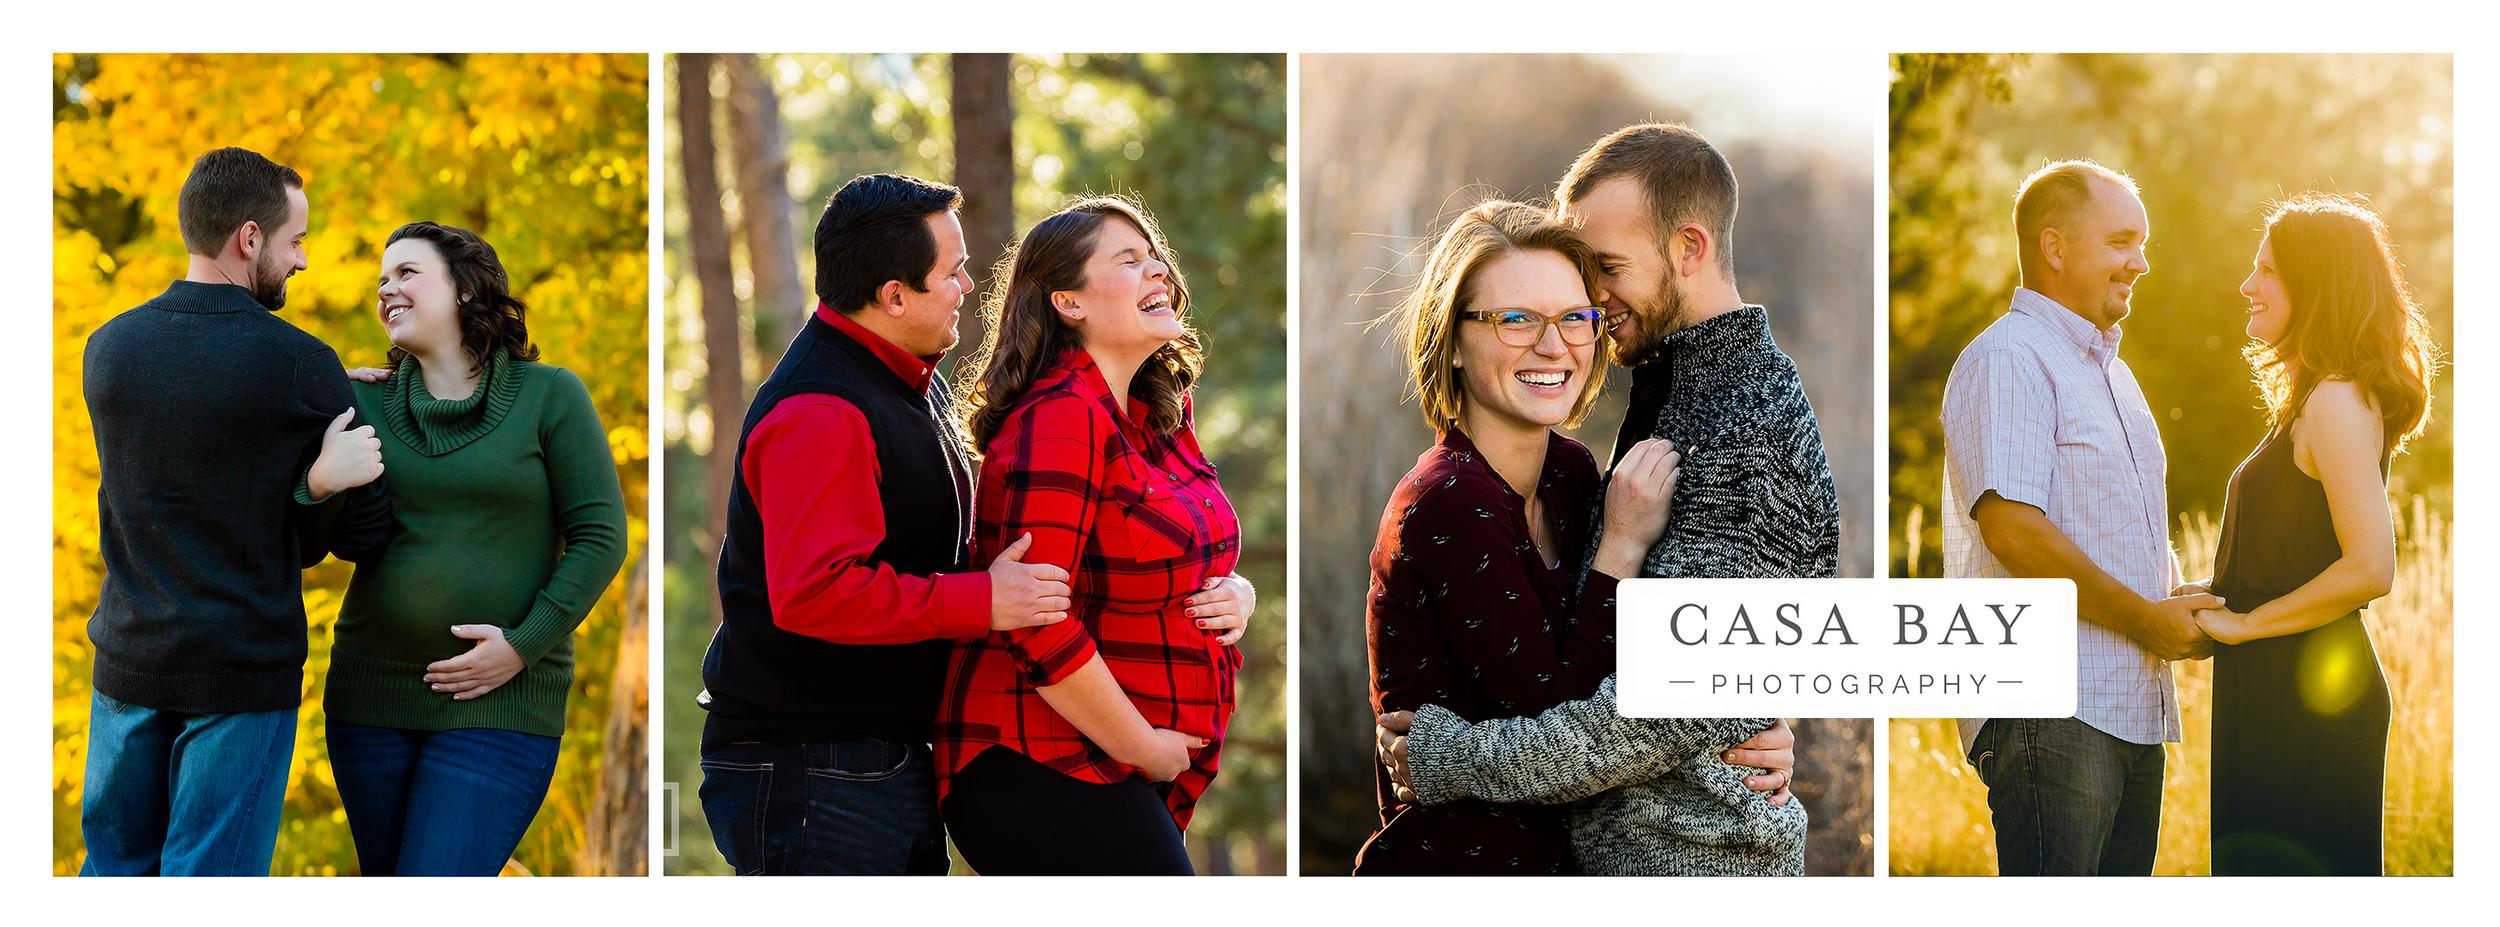 CasaBay Colorado Springs Photography Feb.png